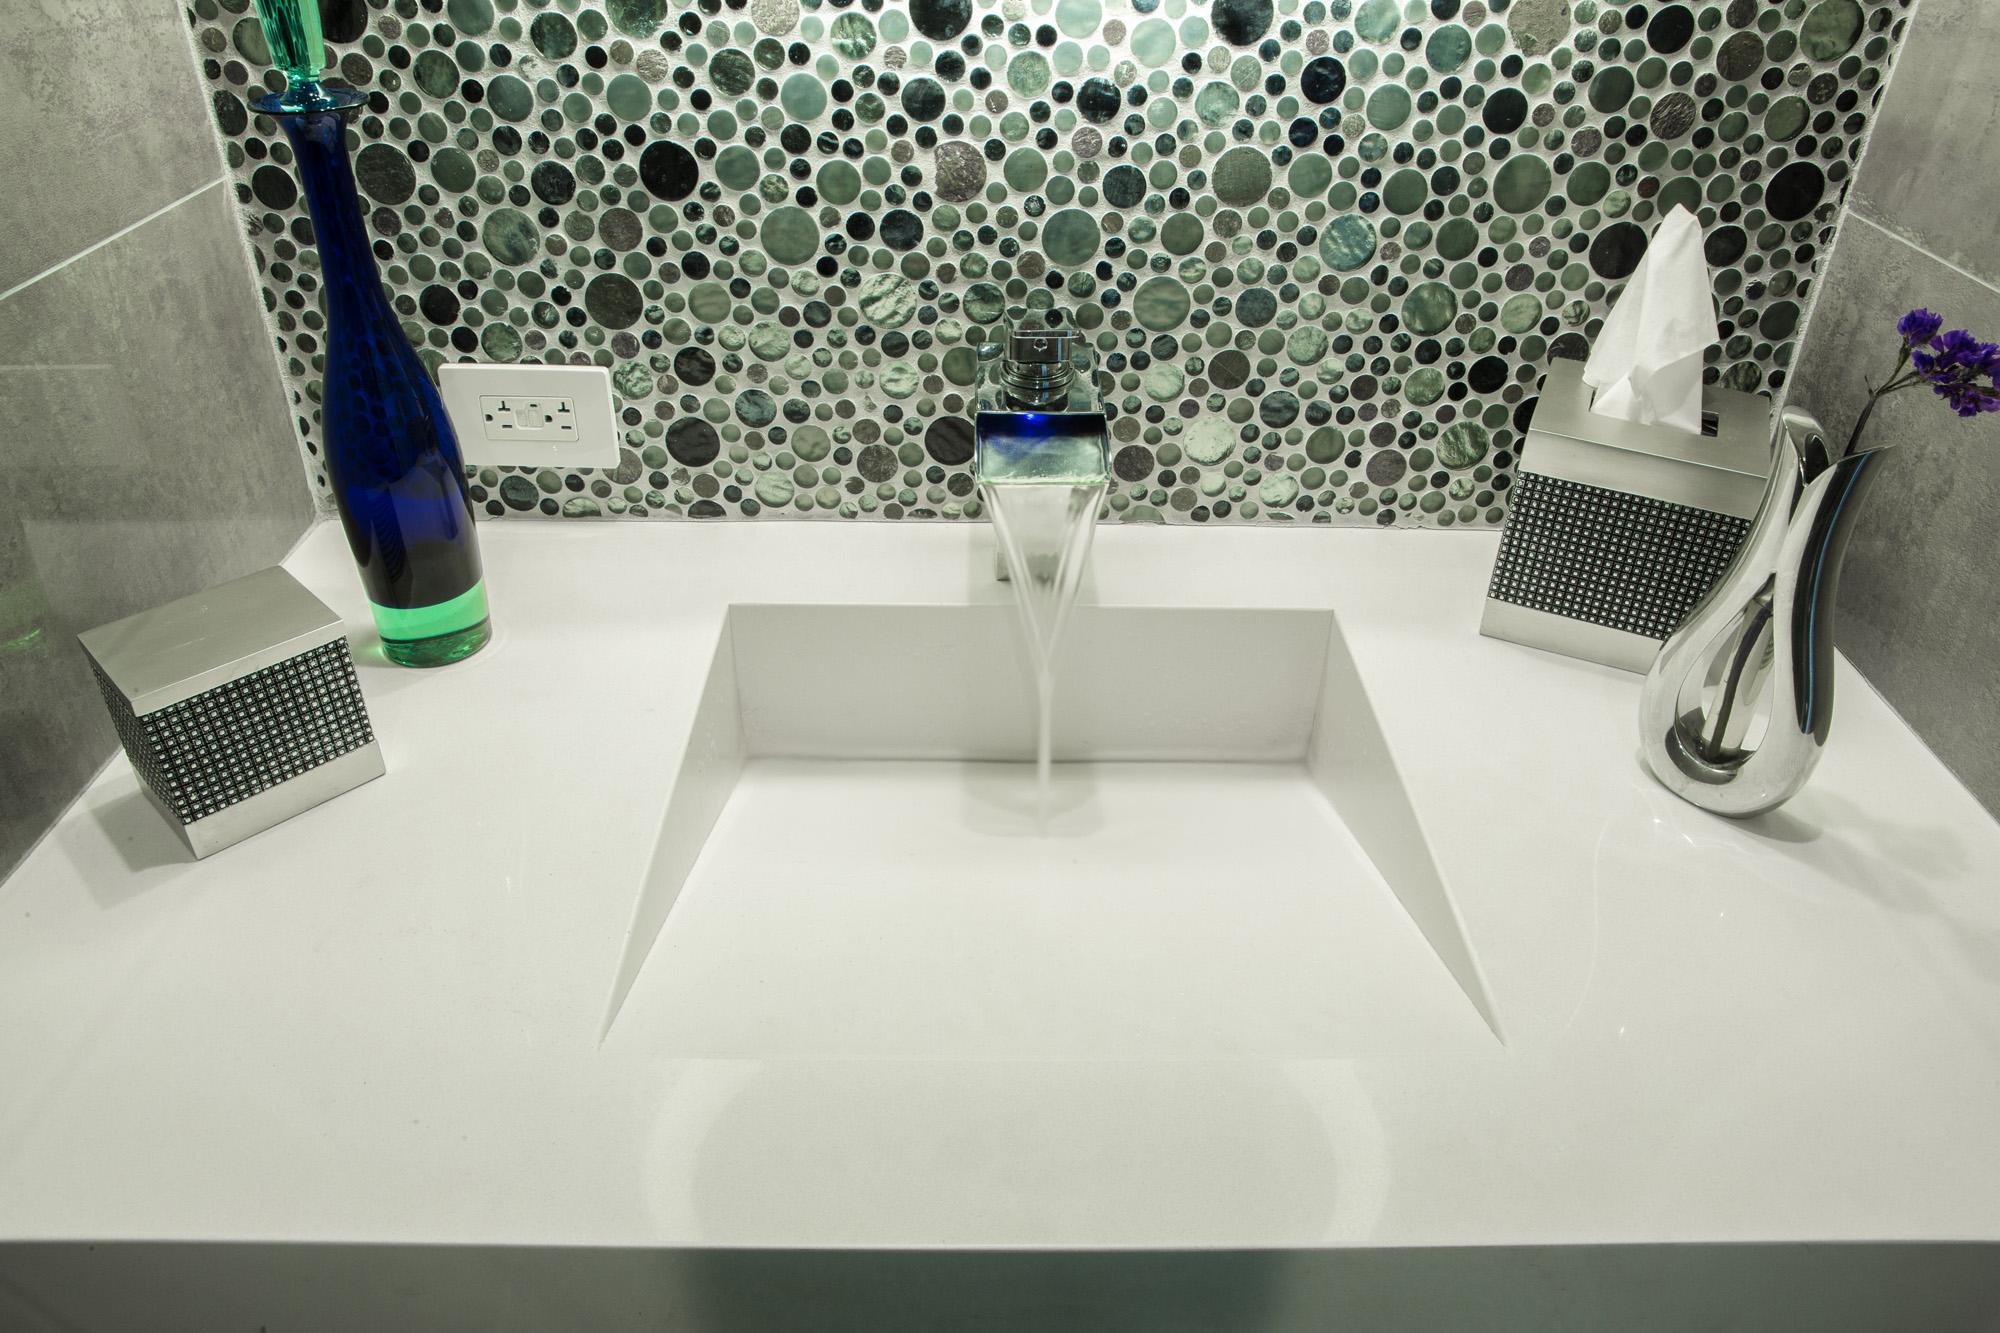 integrated ramp sink.jpg